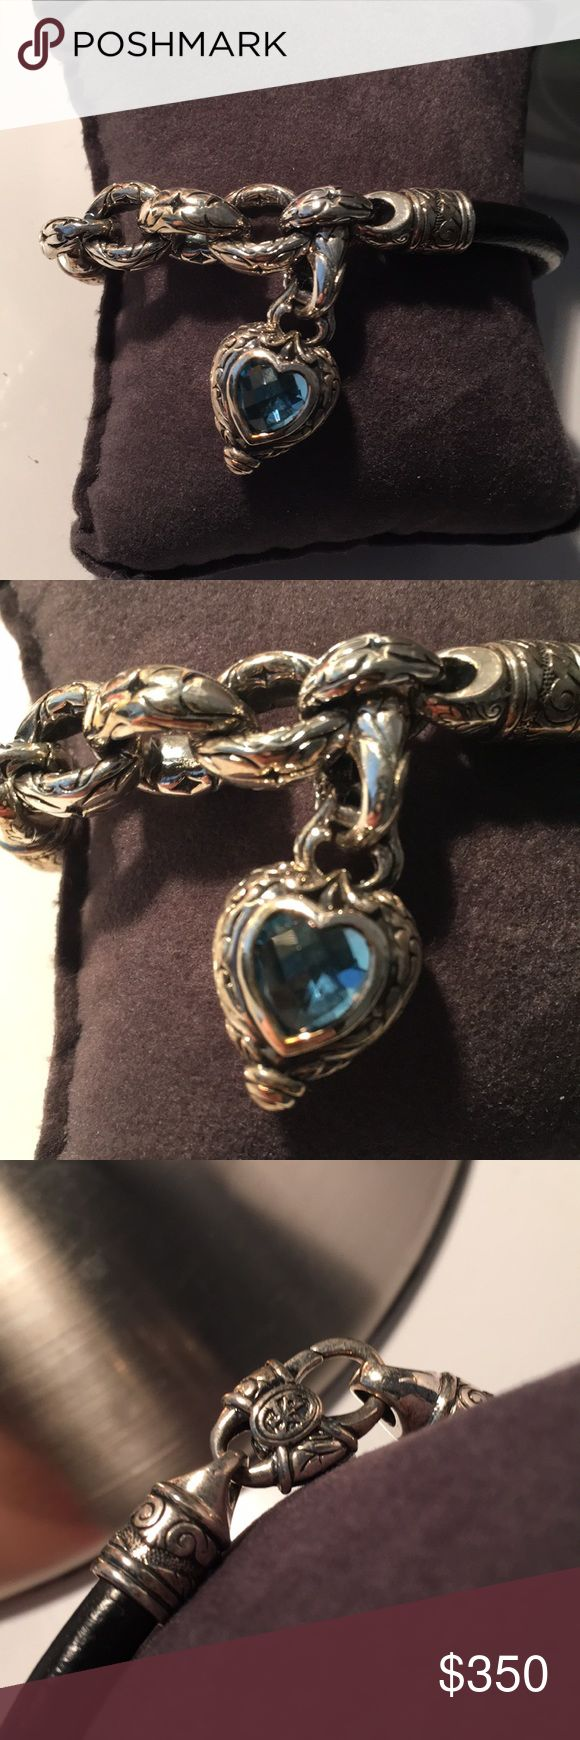 Scott Kay platinum chain link bracelet Scott Kay platinum bracelet with heart pendant and blue stone Scott Kay Jewelry Bracelets